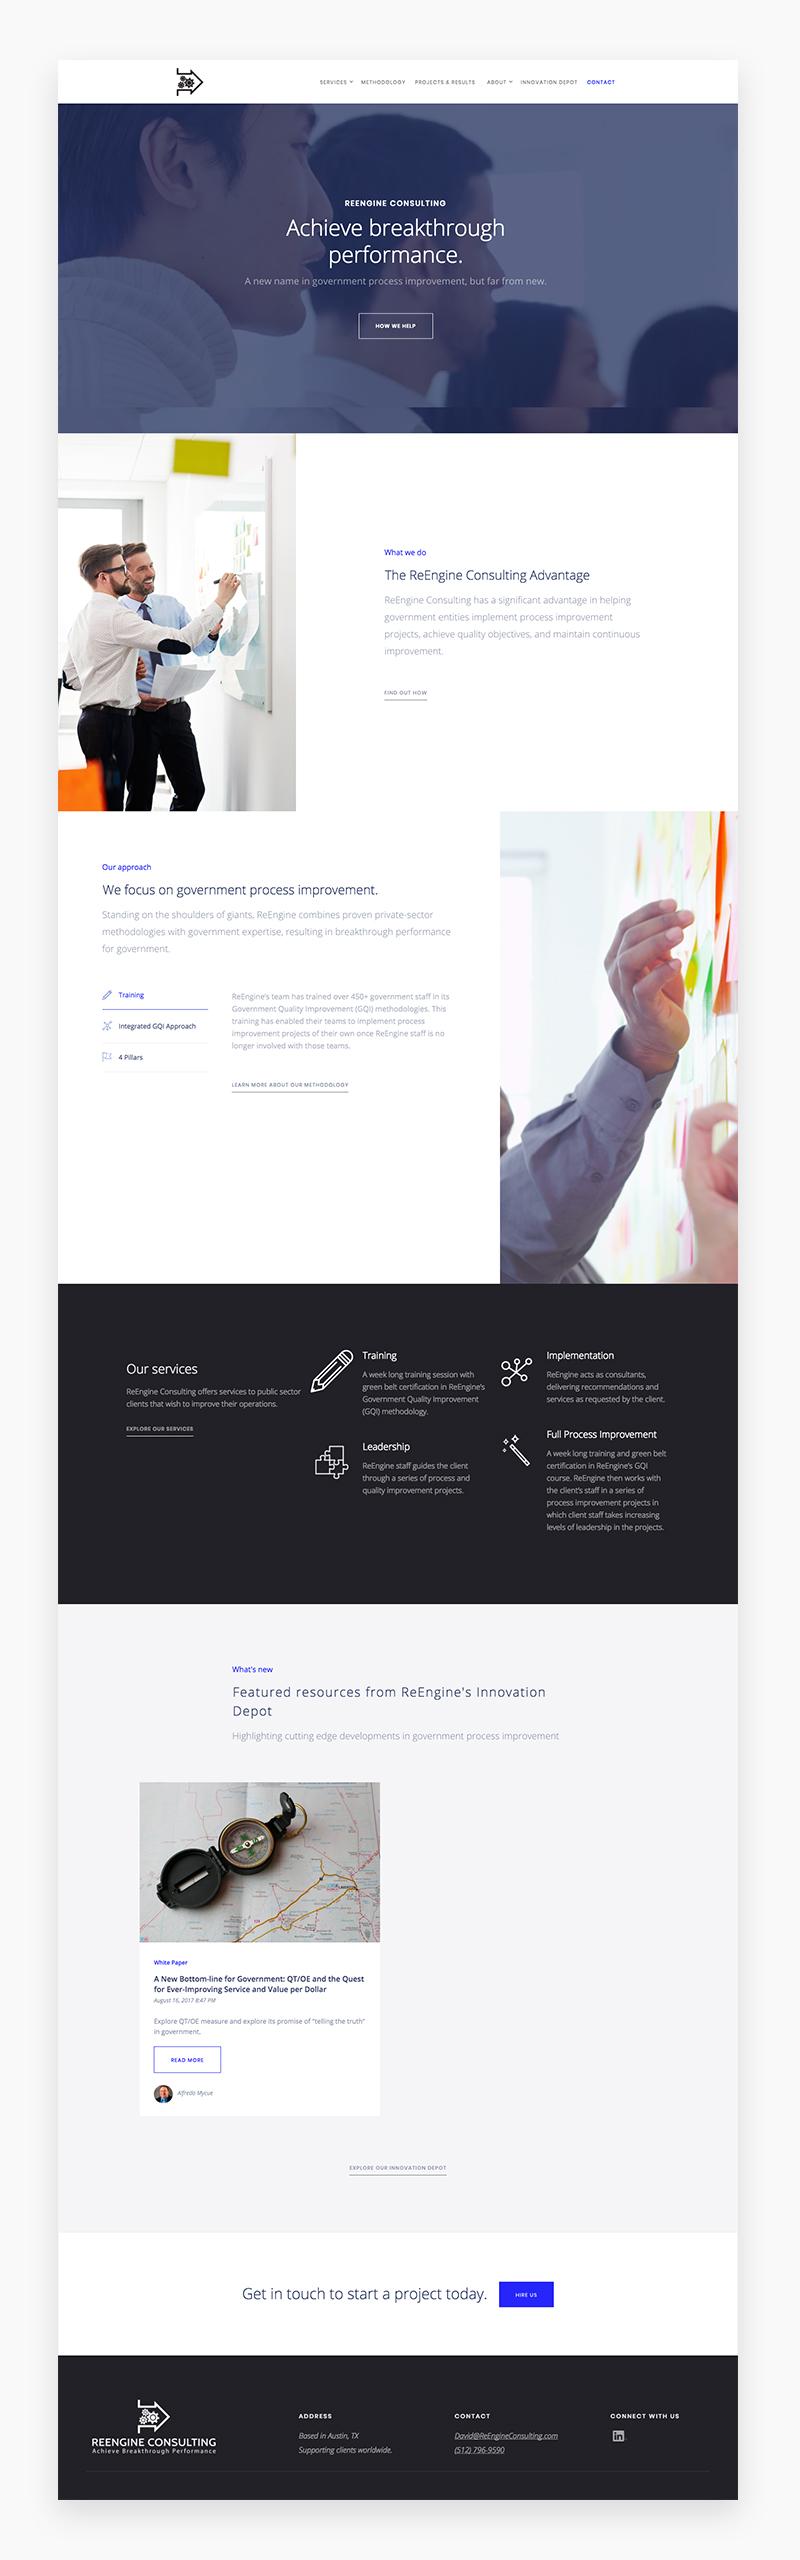 International Student Learning Website Design